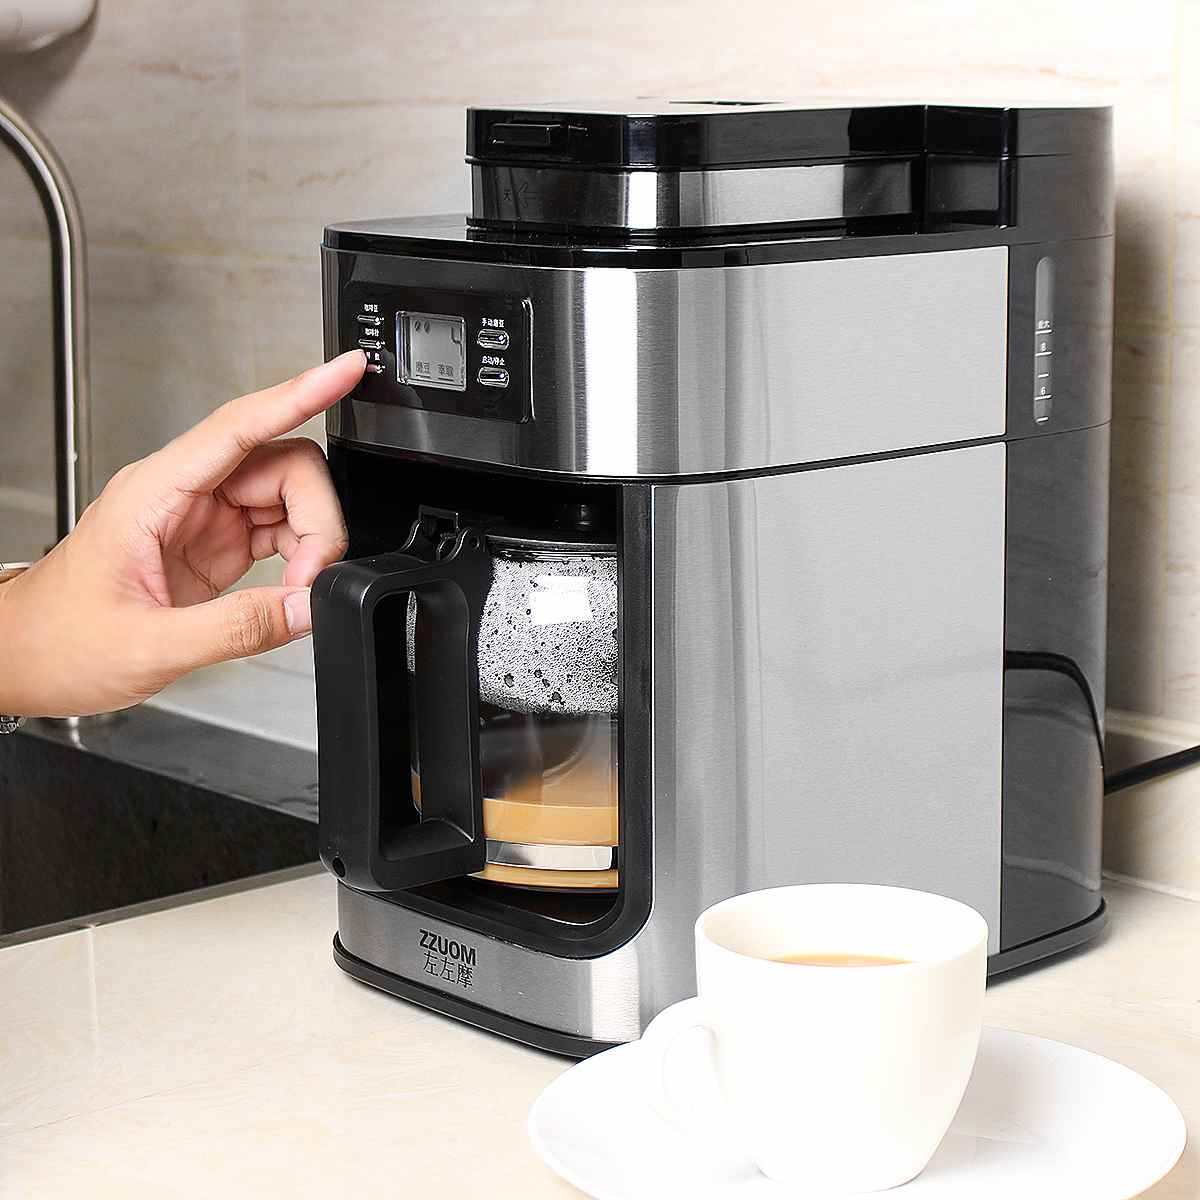 1000W Electric Coffee Maker Machine Fully-Automatic Drip Coffee Maker Tea Coffee Pot Barista Home Kitchen Appliance 1200ml 220V